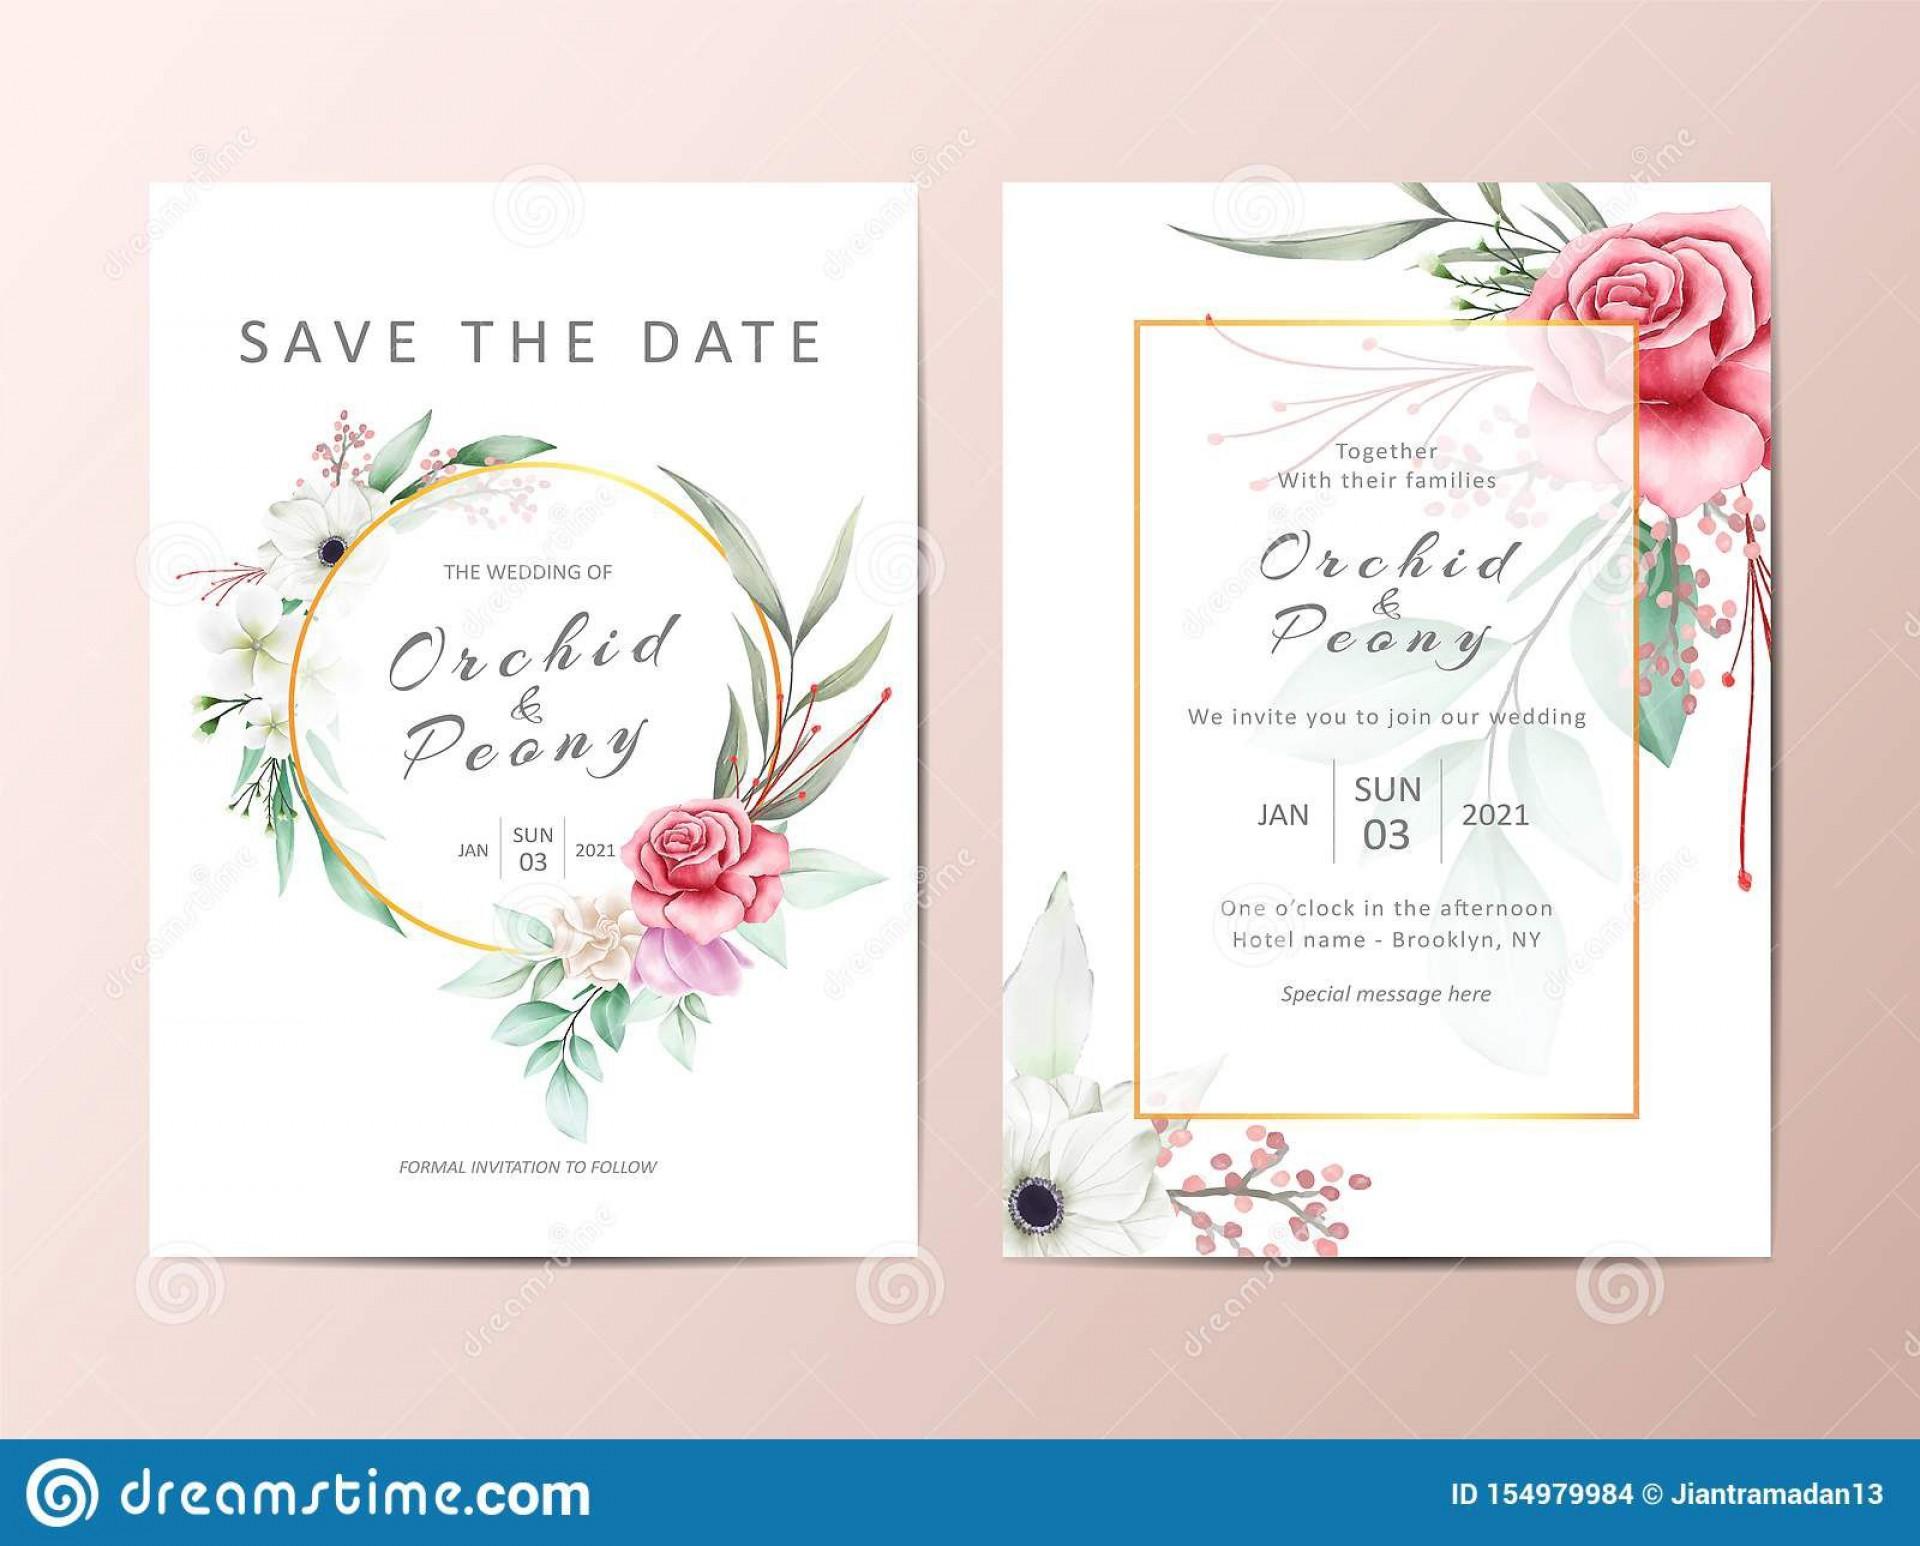 004 Rare Editable Wedding Invitation Template Idea  Templates Tamil Card Free Download Psd Online1920